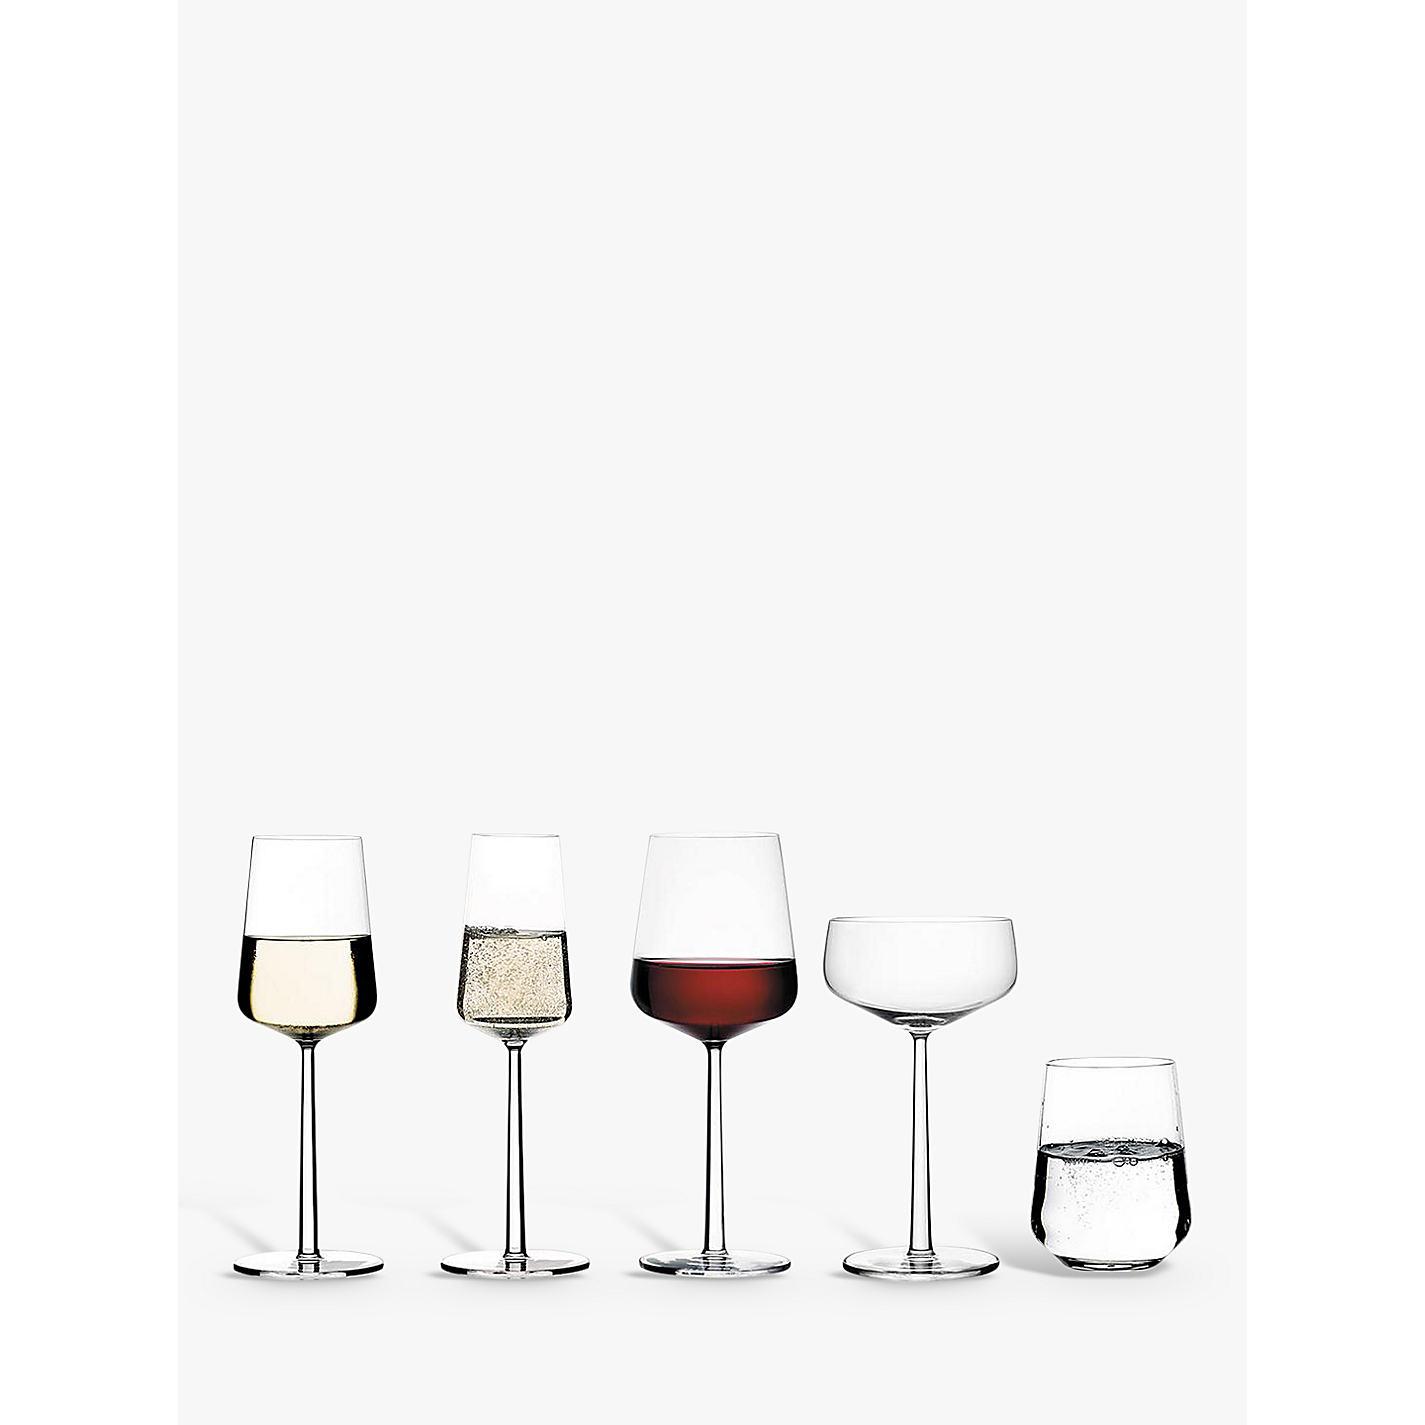 Iittala Essence Wine Gles Cbaarch